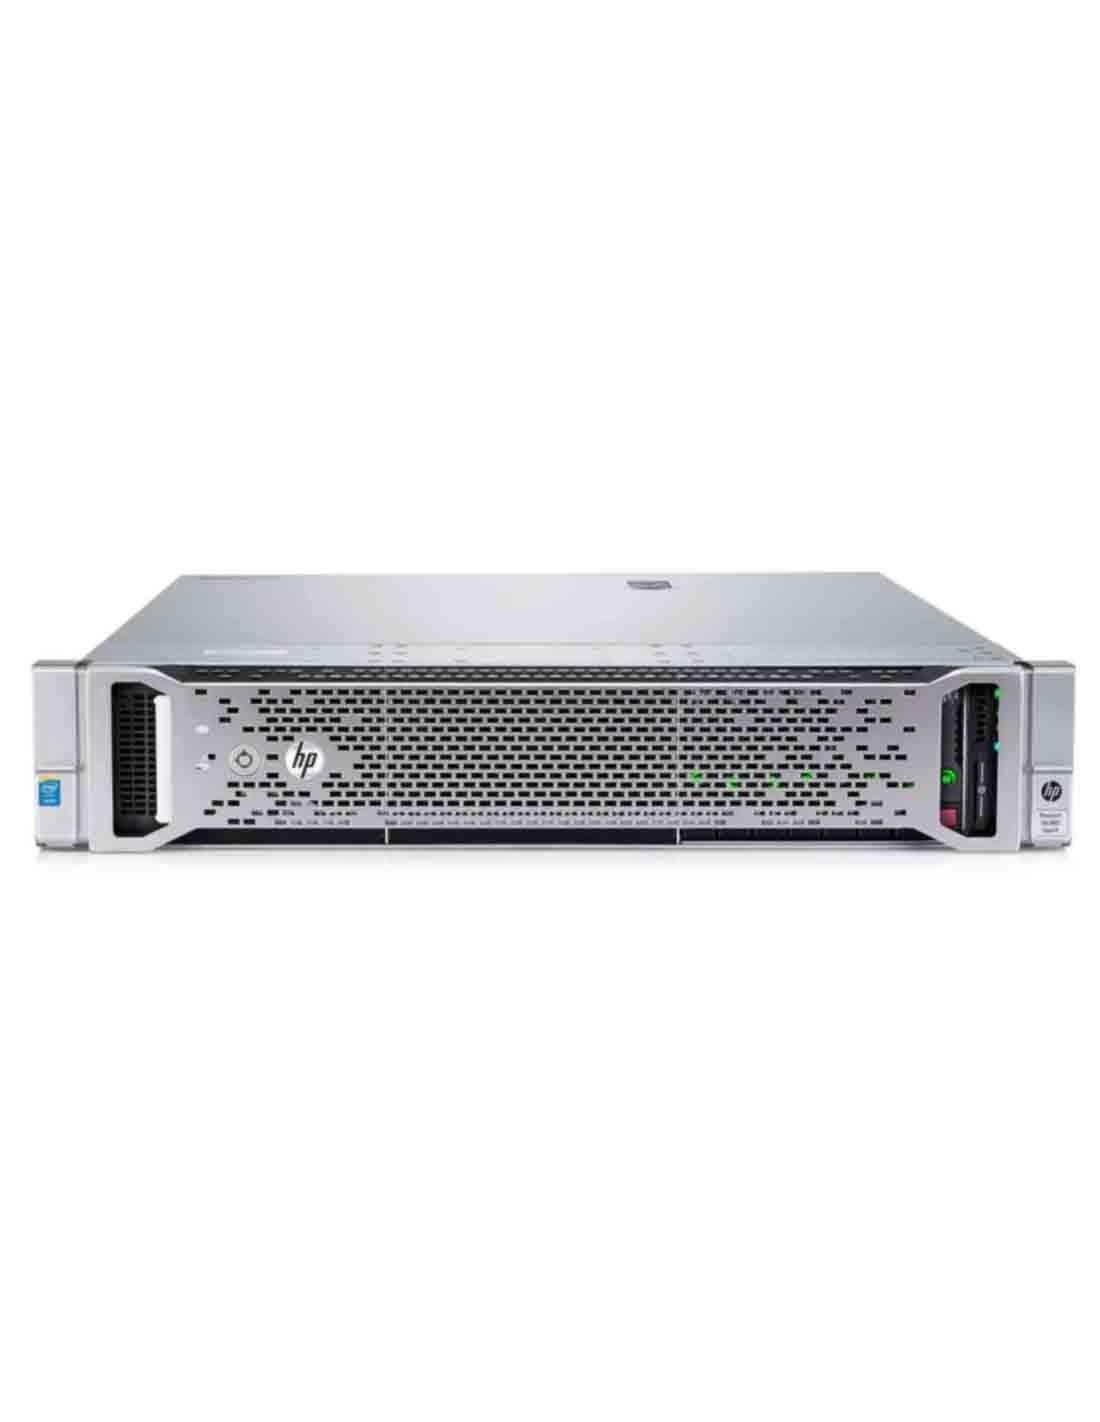 HP ProLiant DL380 Gen9 E5-2630v3 Server is productive